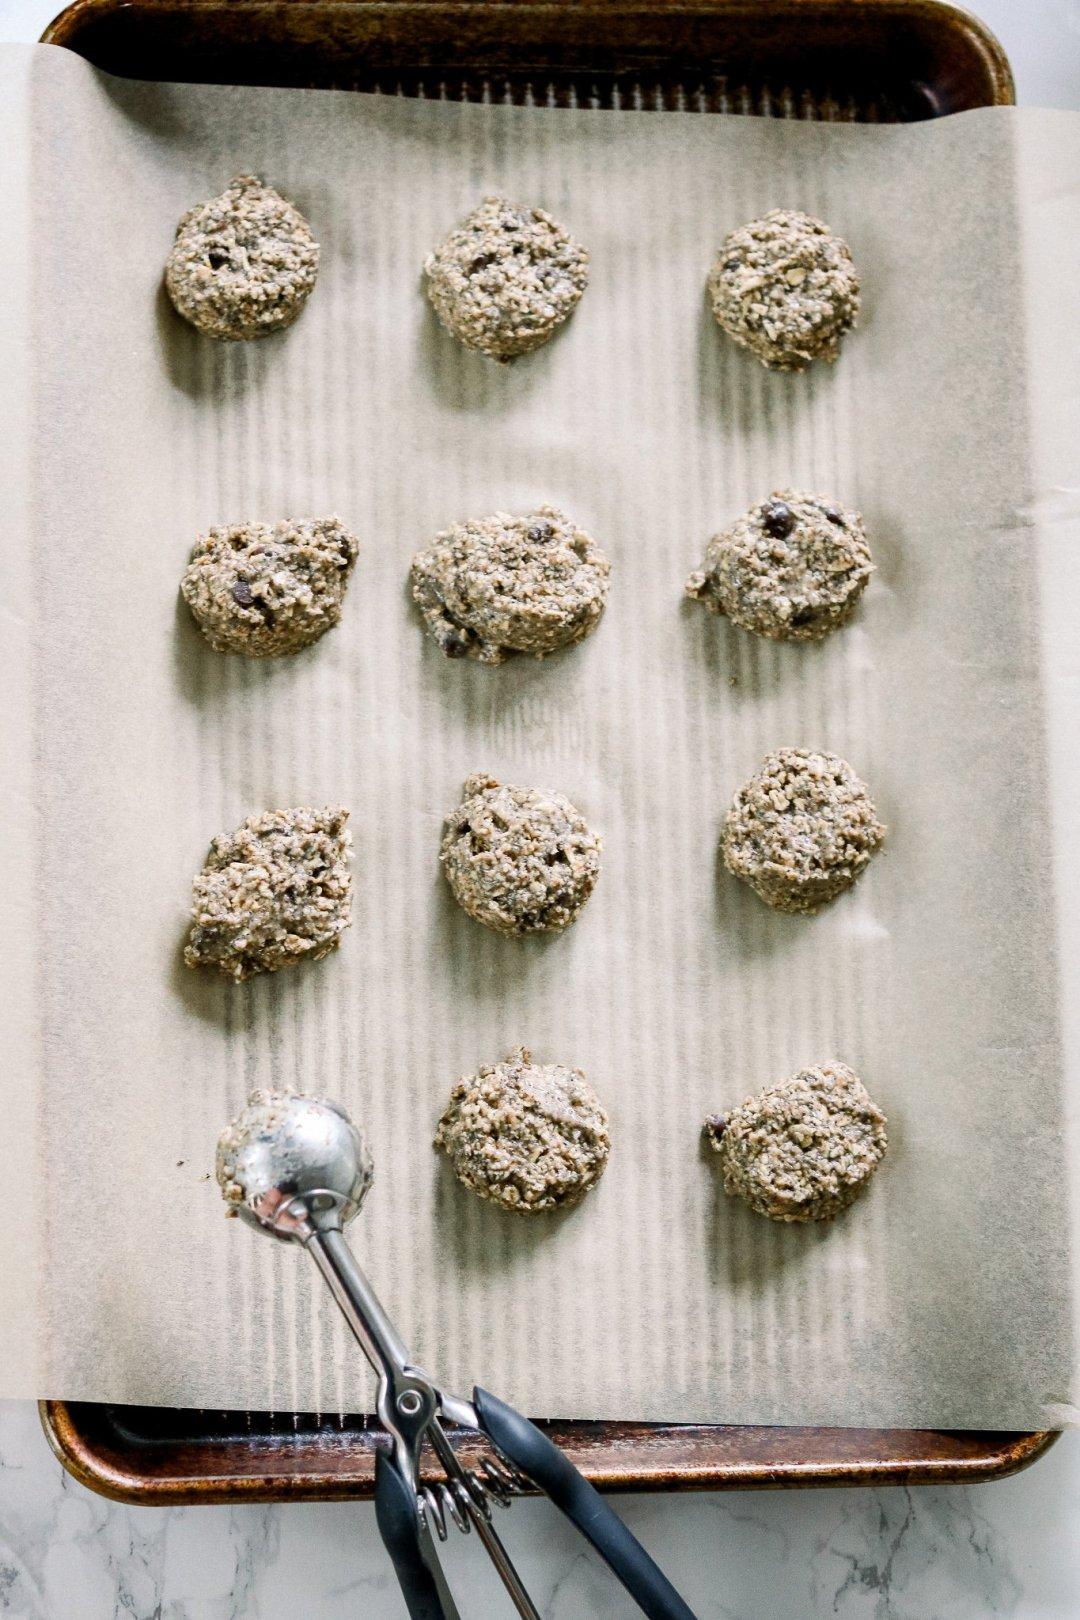 Homemade healthy cookies